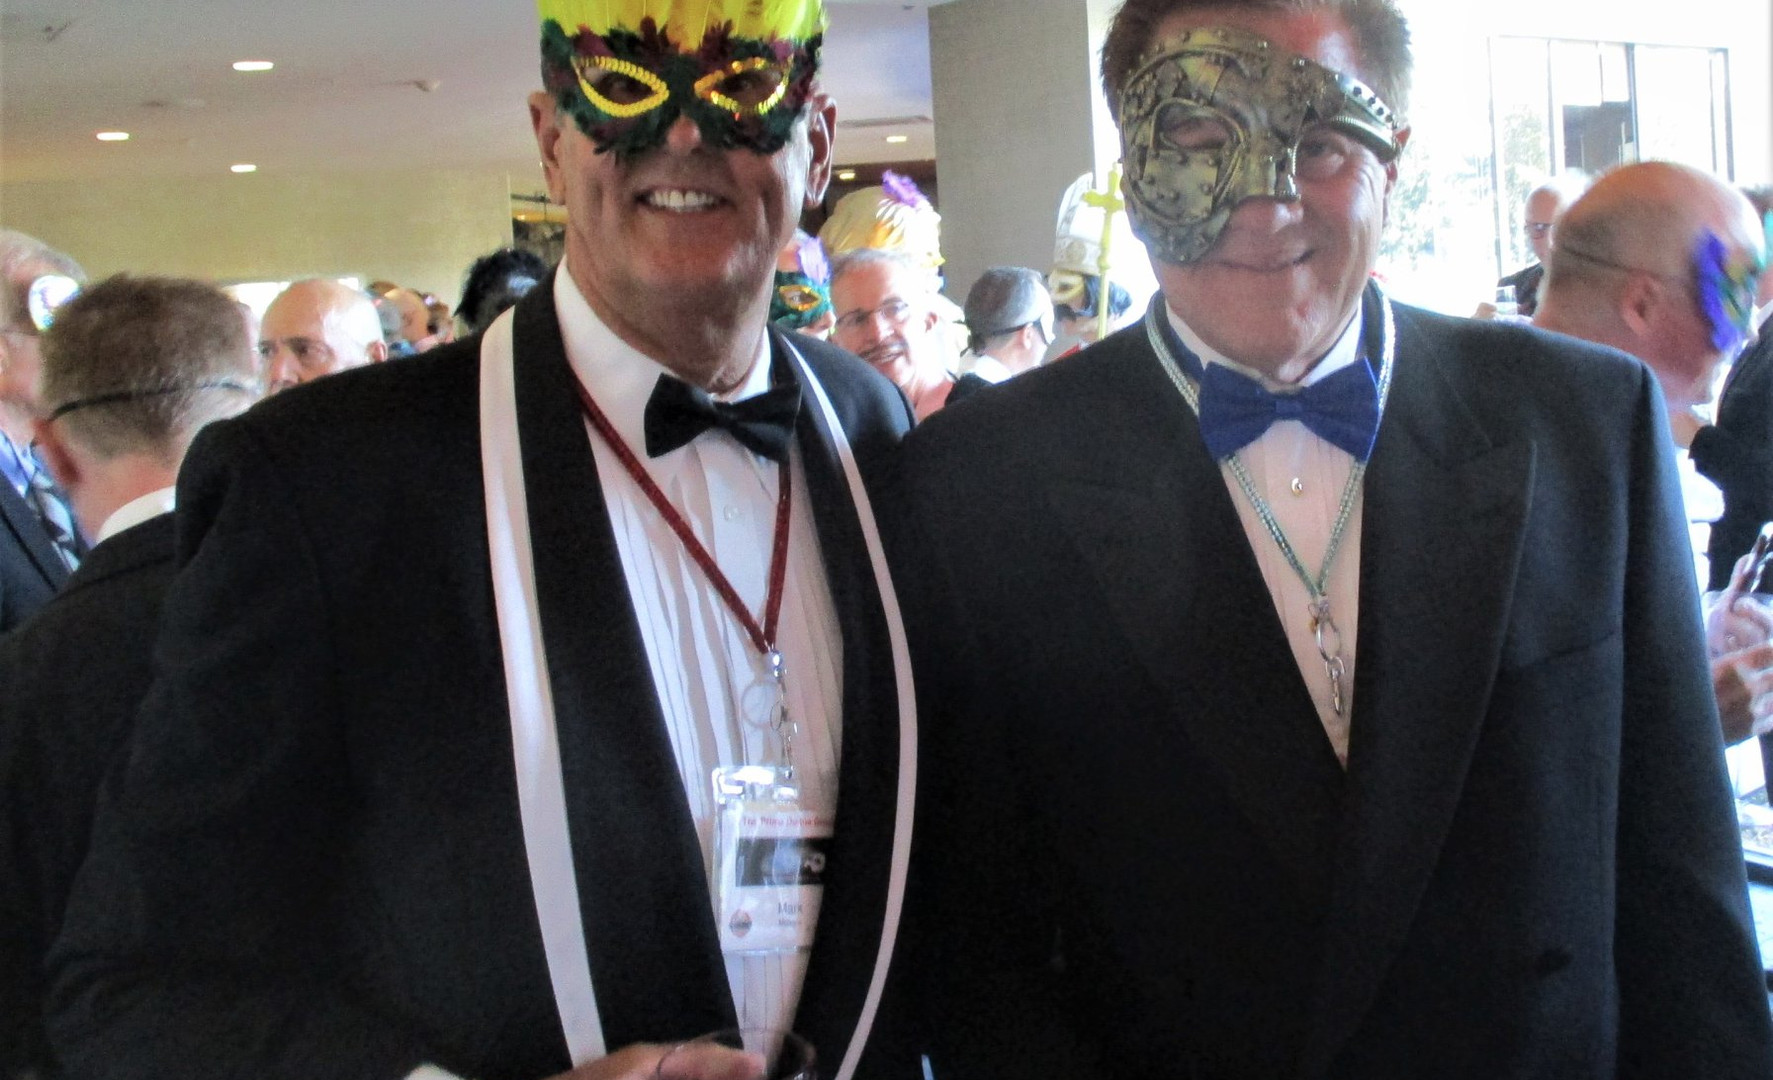 Masquerade Ball - well dressed.jpg